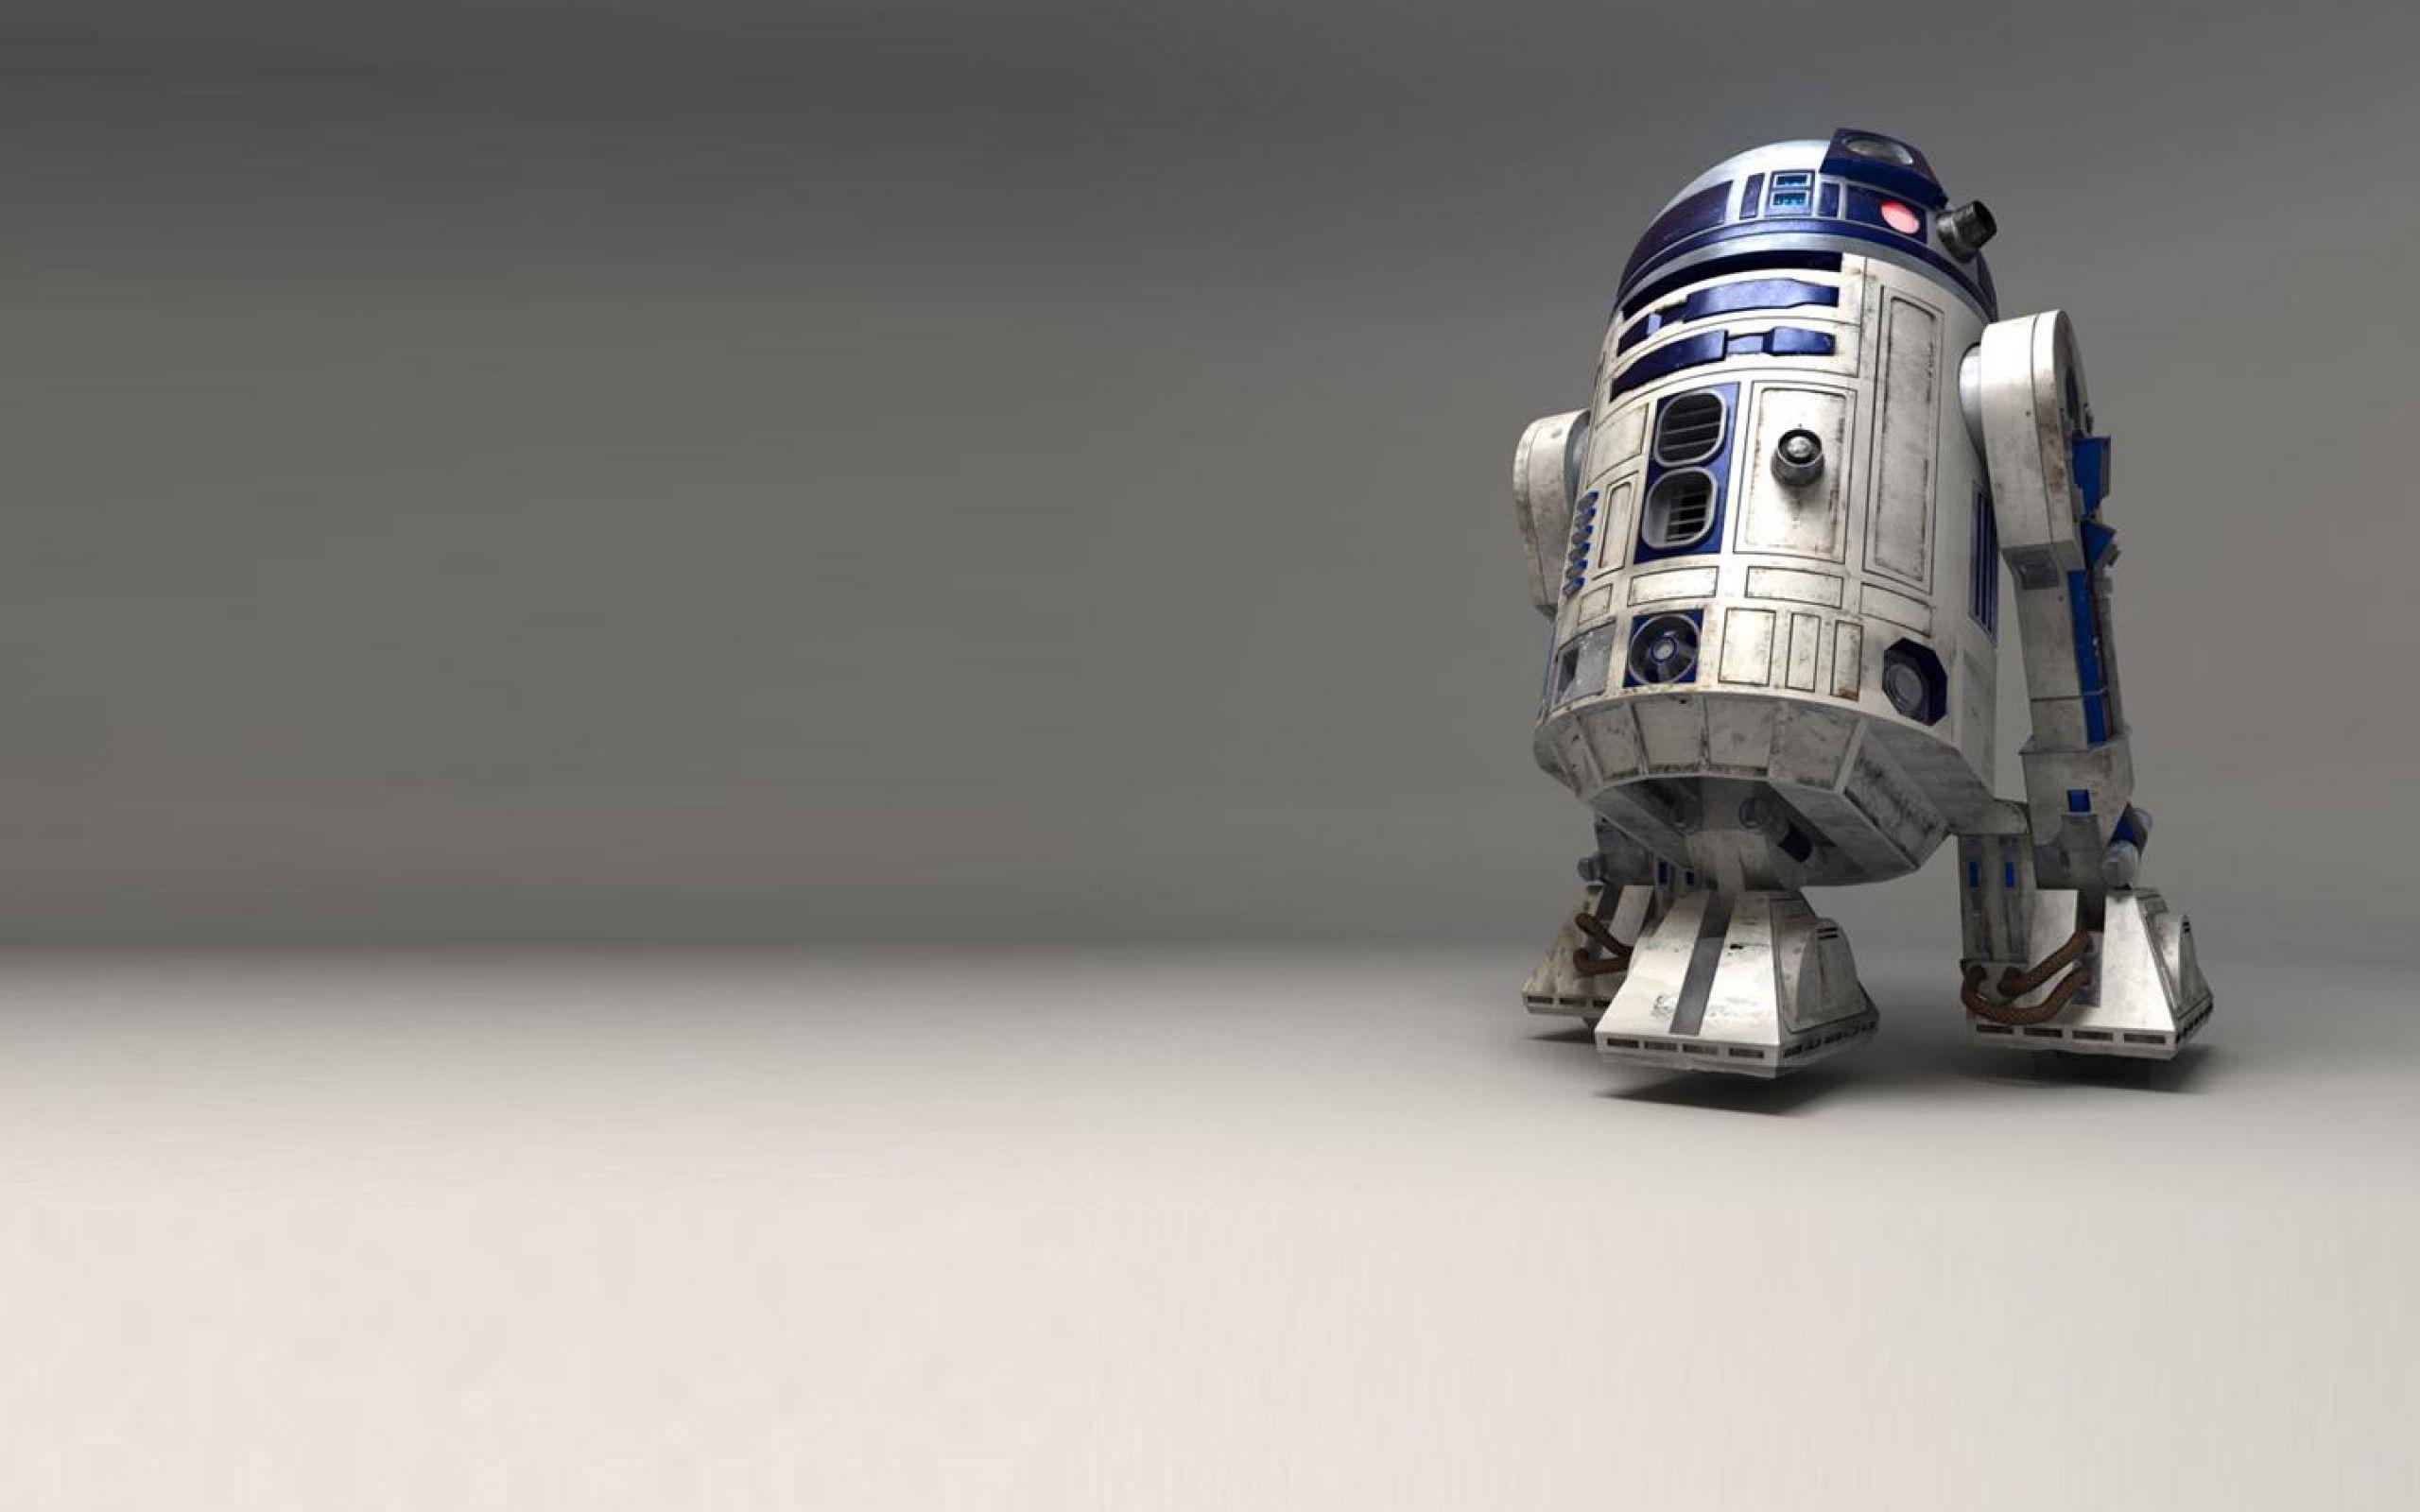 Star Wars Desktop Wallpapers - Wallpaper Cave